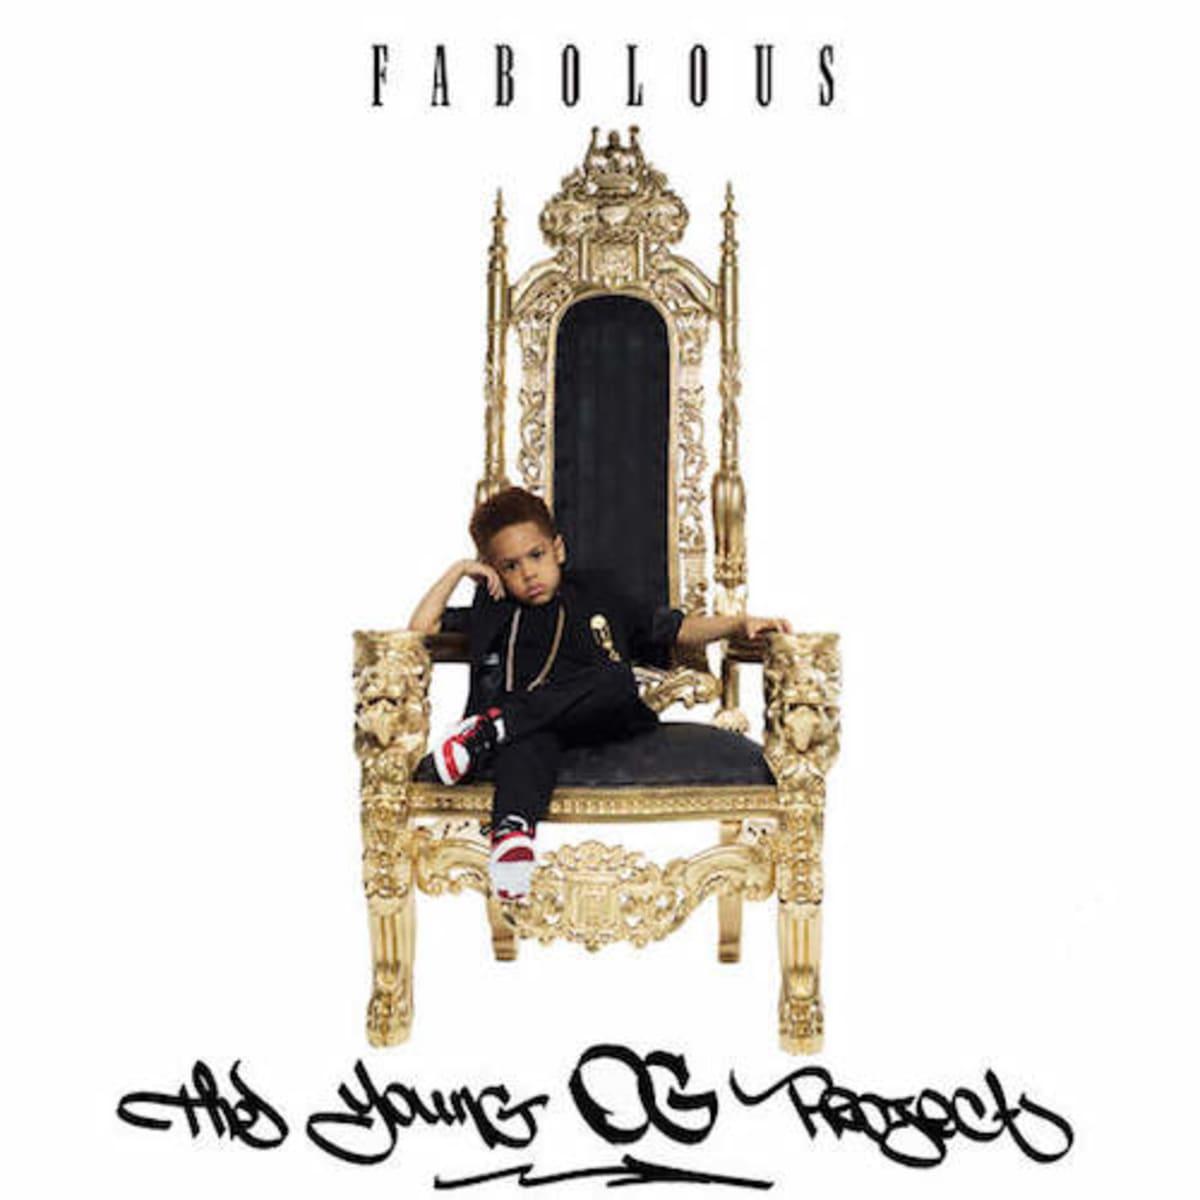 Fabolous_TheYoungOGProject.jpg